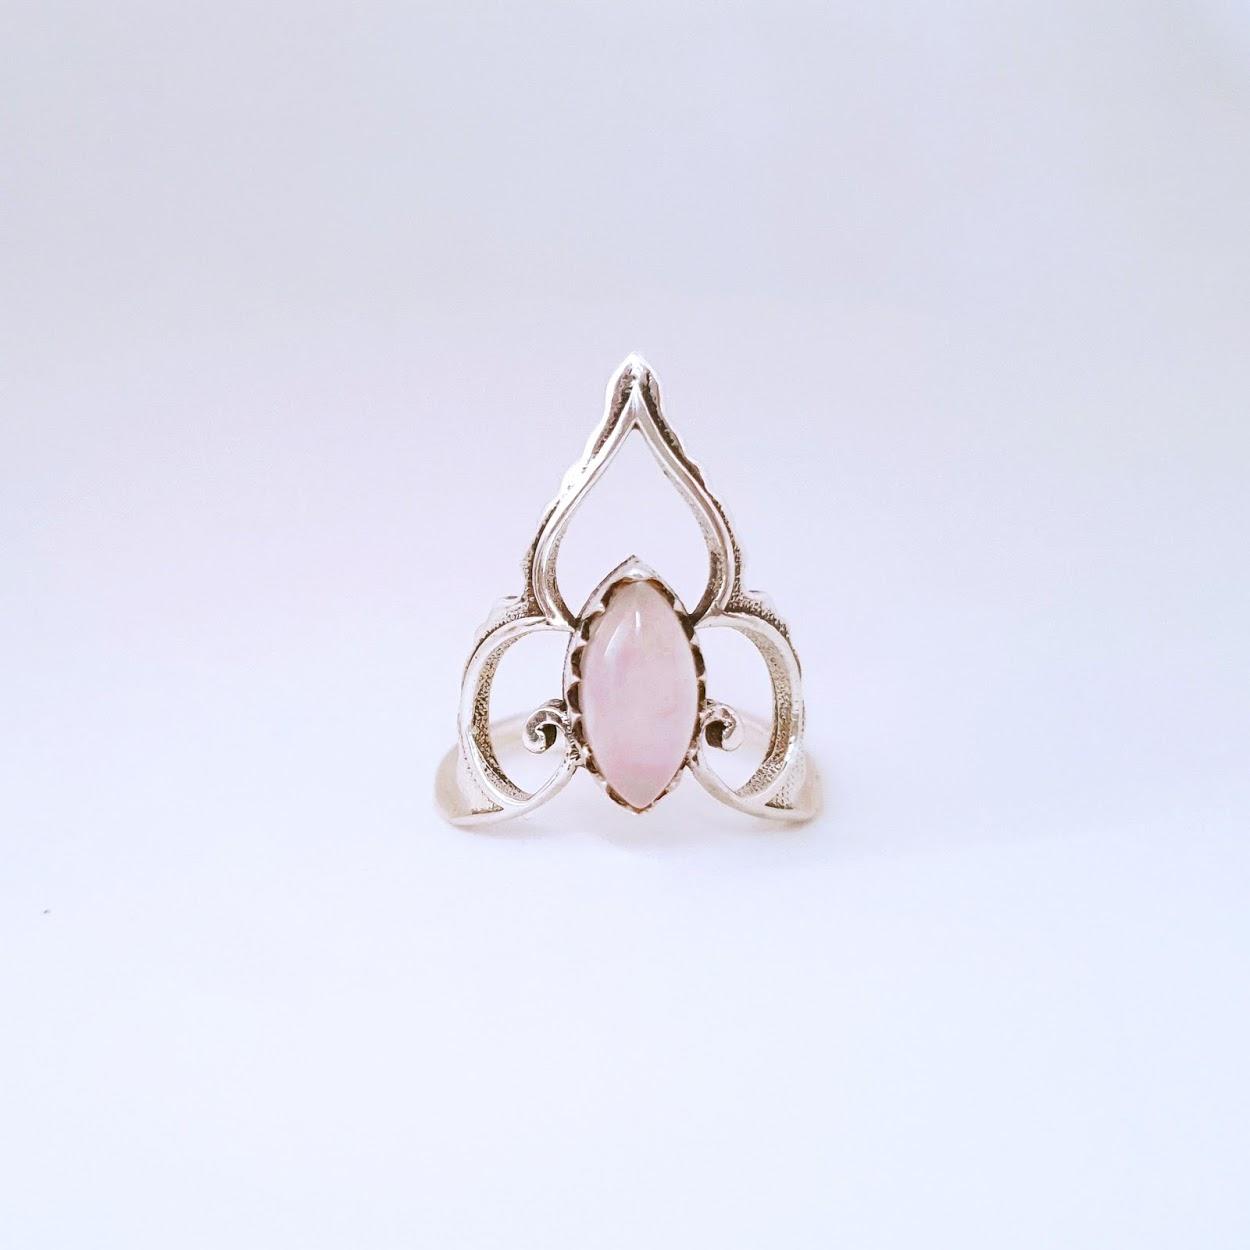 Anel de Prata Coroa Quartzo Rosa